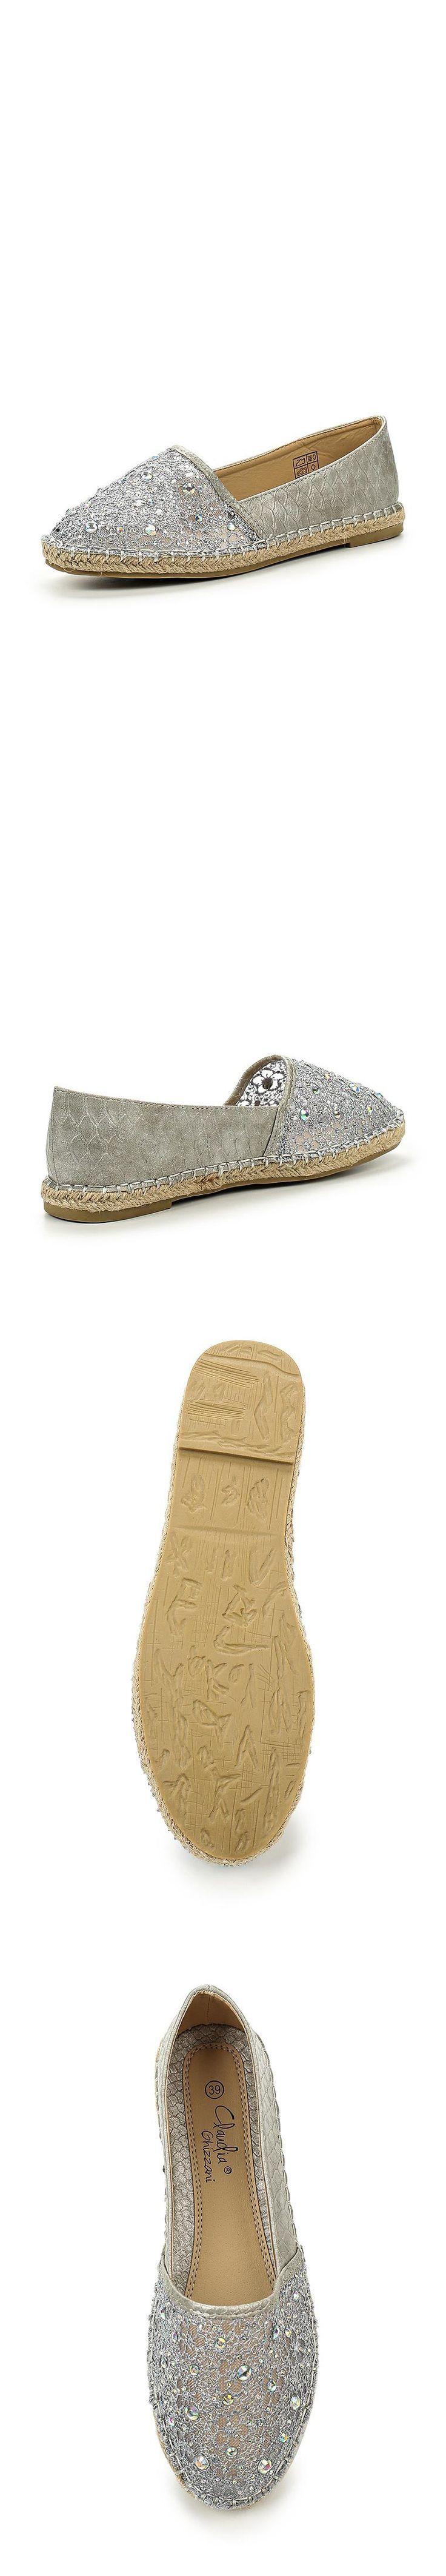 Женская обувь эспадрильи CLAUDIA GHIZZANI за 3299.00 руб.